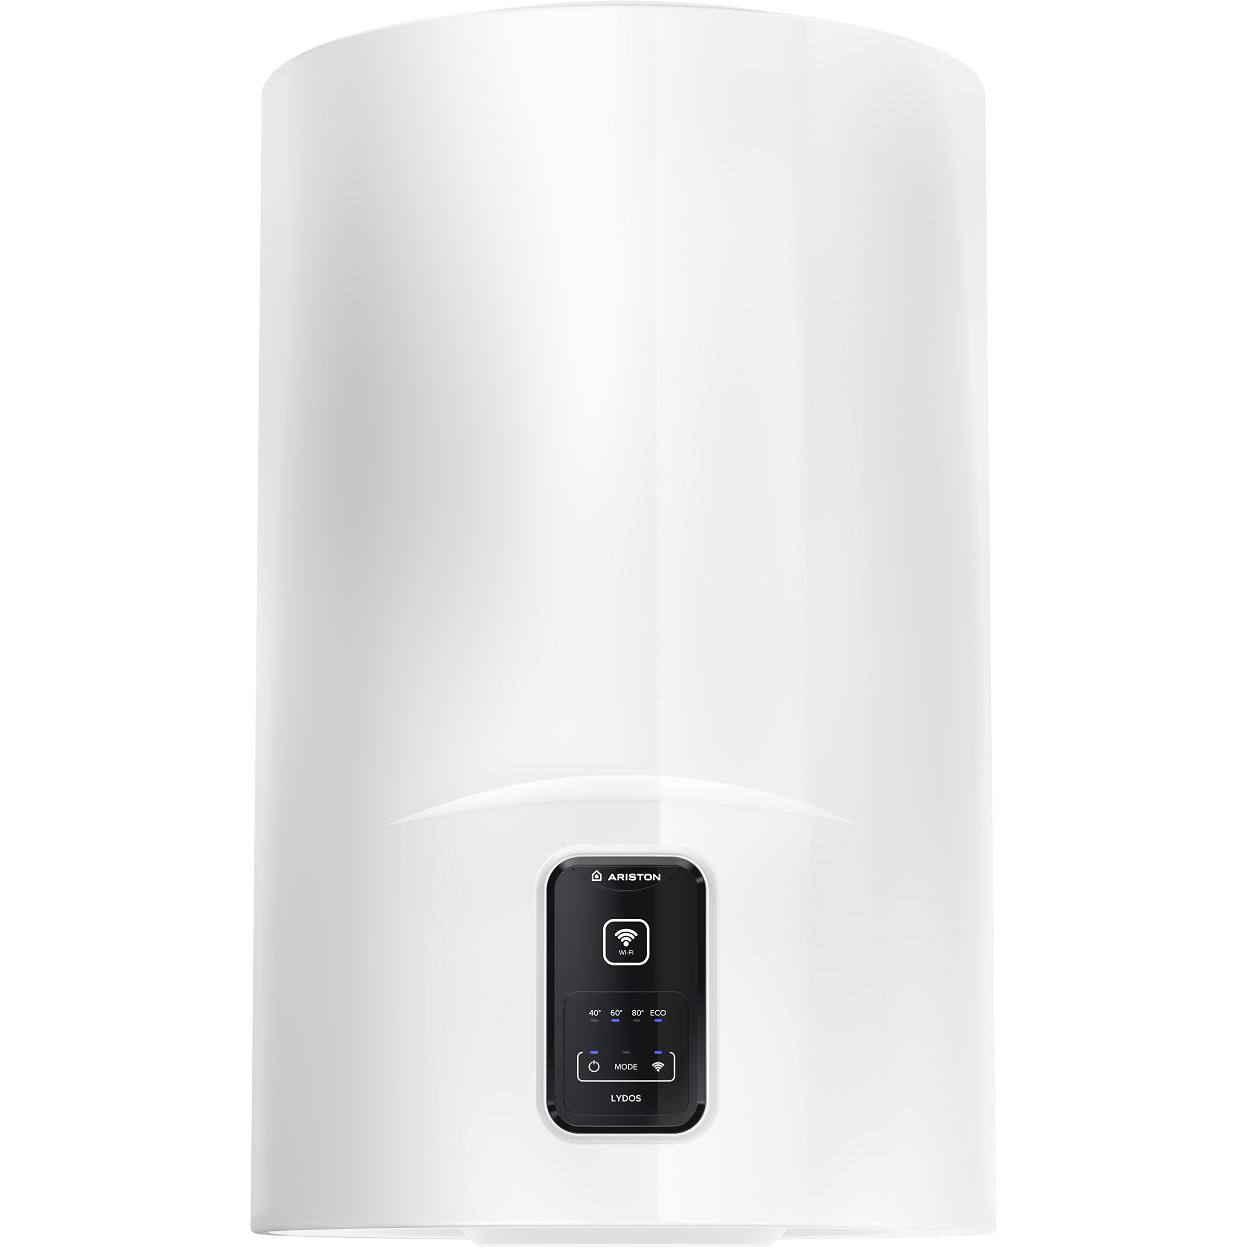 Fotografie Boiler electric Ariston Lydos Wi-Fi 50L, 1800 W, conectivitate internet, rezervor emailat cu Titan